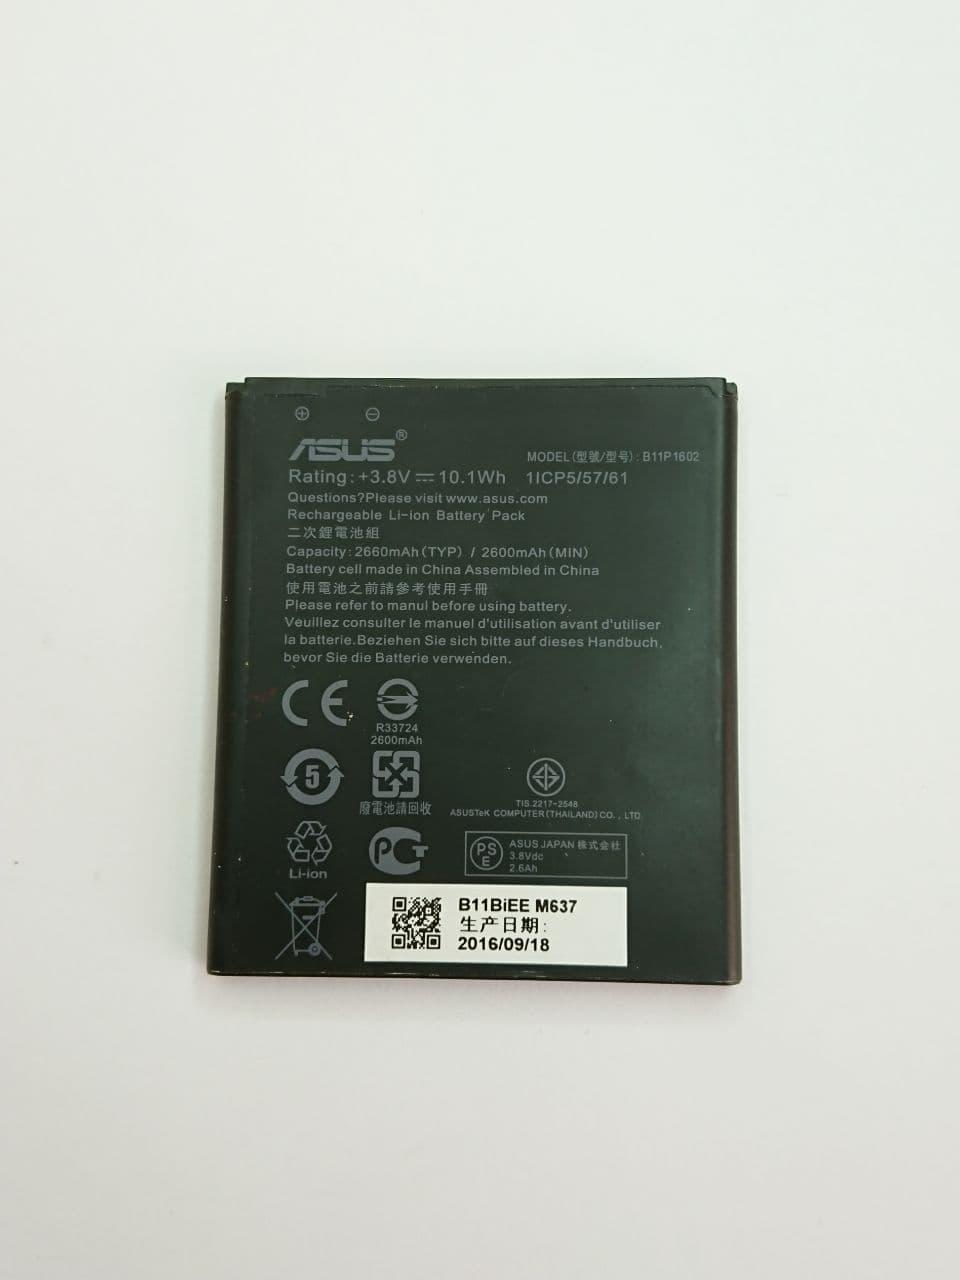 Акумуляторна батарея (АКБ) Asus B11P1602 для B500KL, ZB500KG Zenfone Go, ZB501KL ZenFone Live, 2660 mAh оригінал б.у.